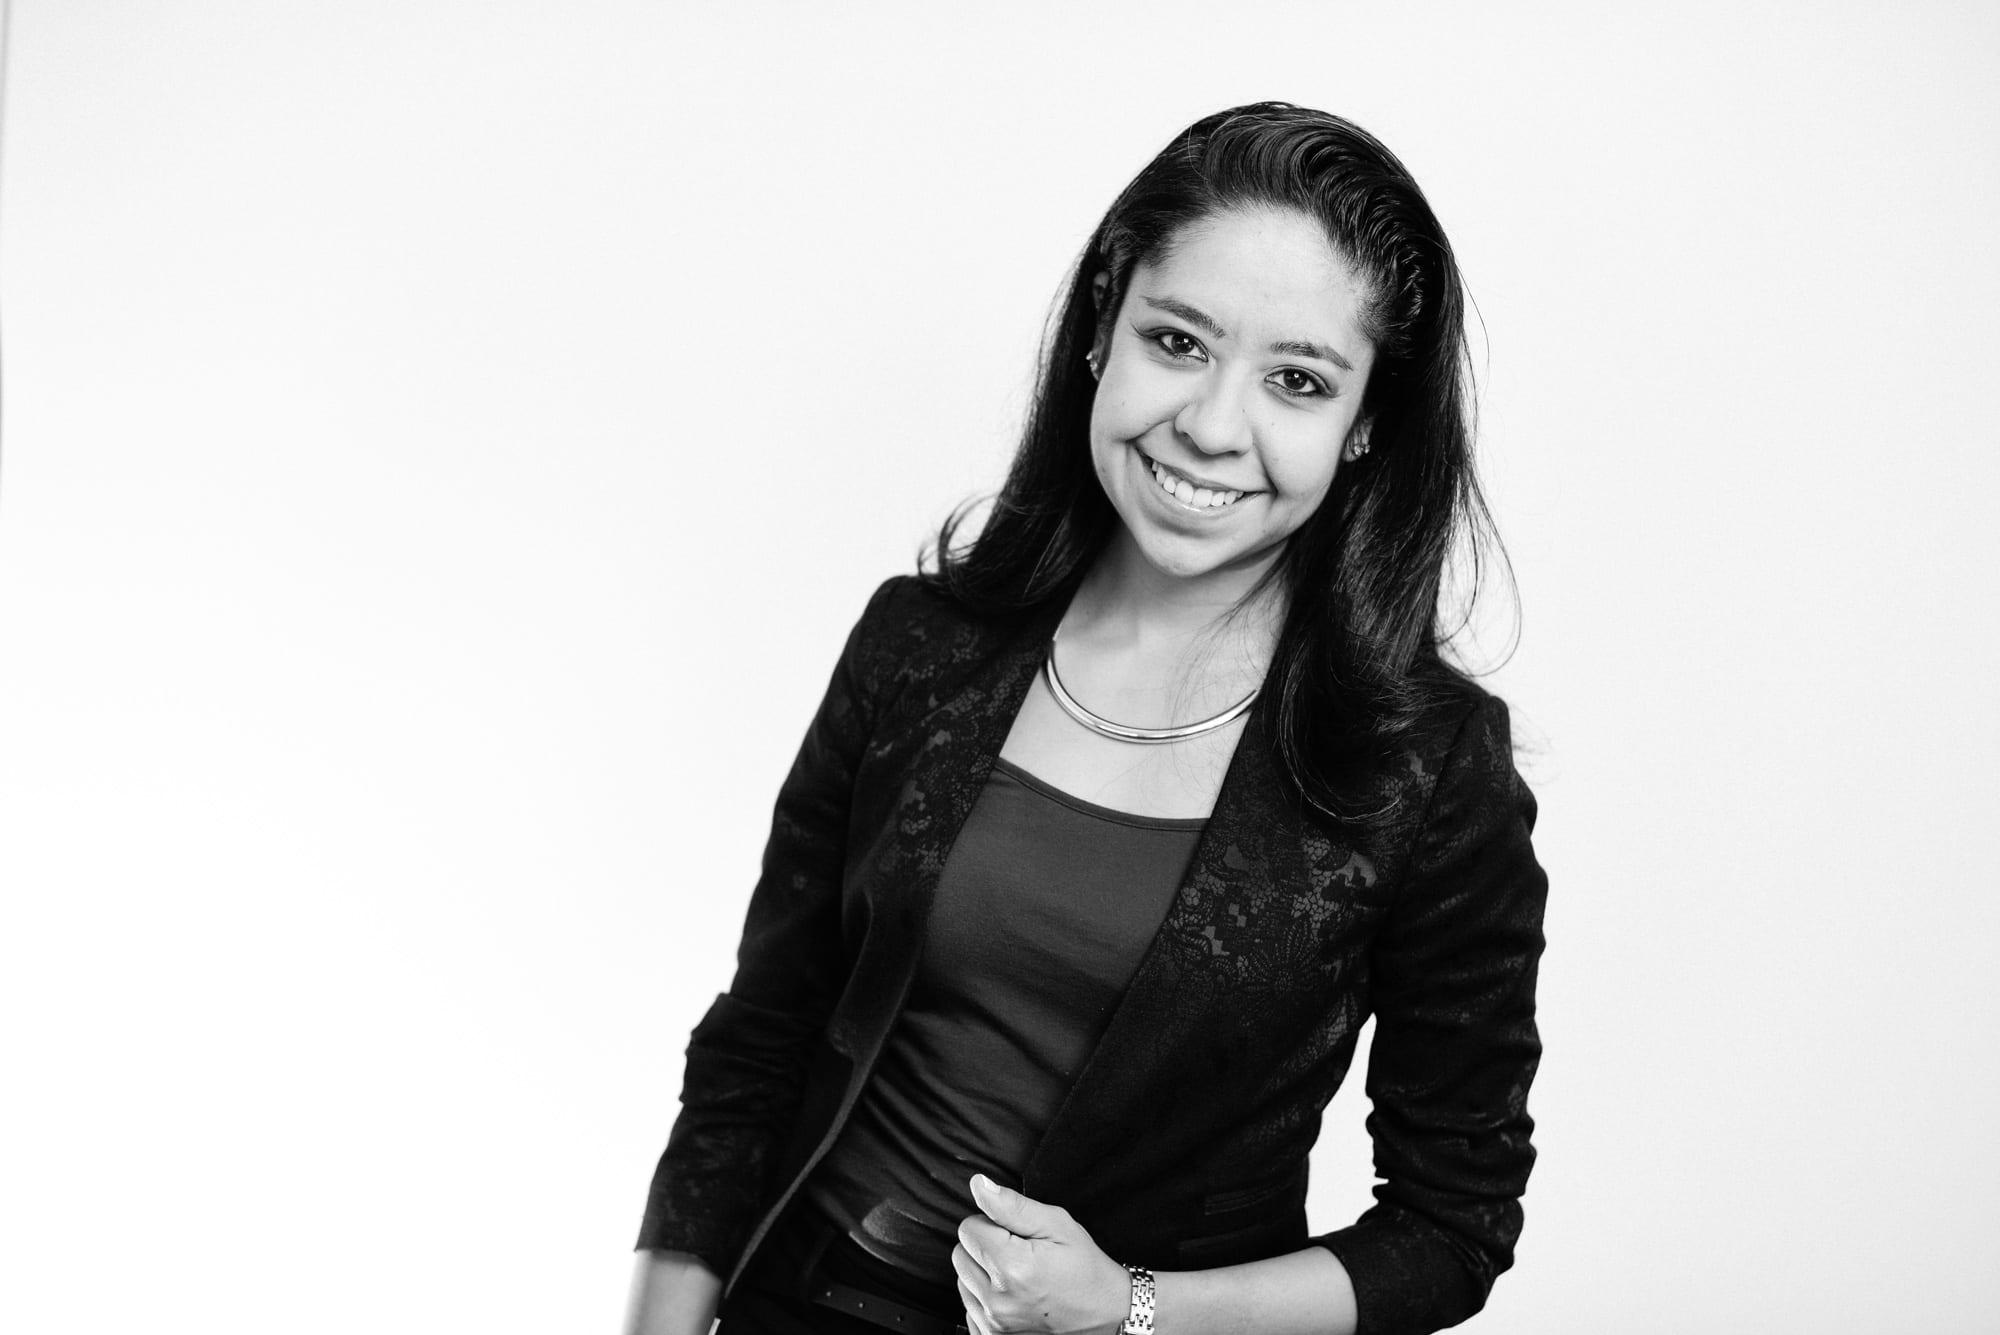 SMU Journalism Student Profile